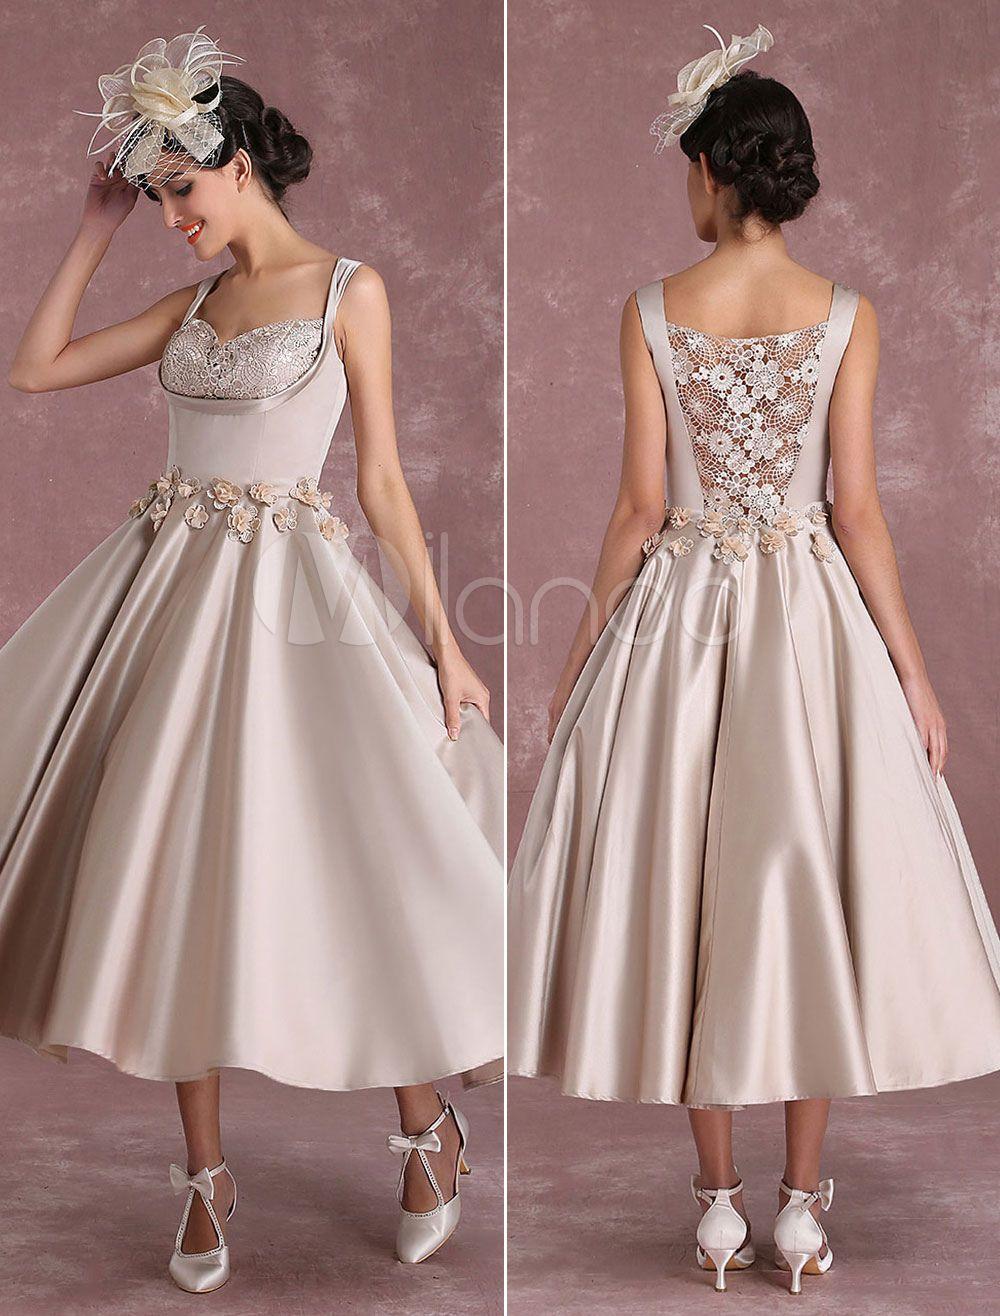 Vintage Brautkleid Prinzessin wadenlang Satingewebe mit eingebautem ...